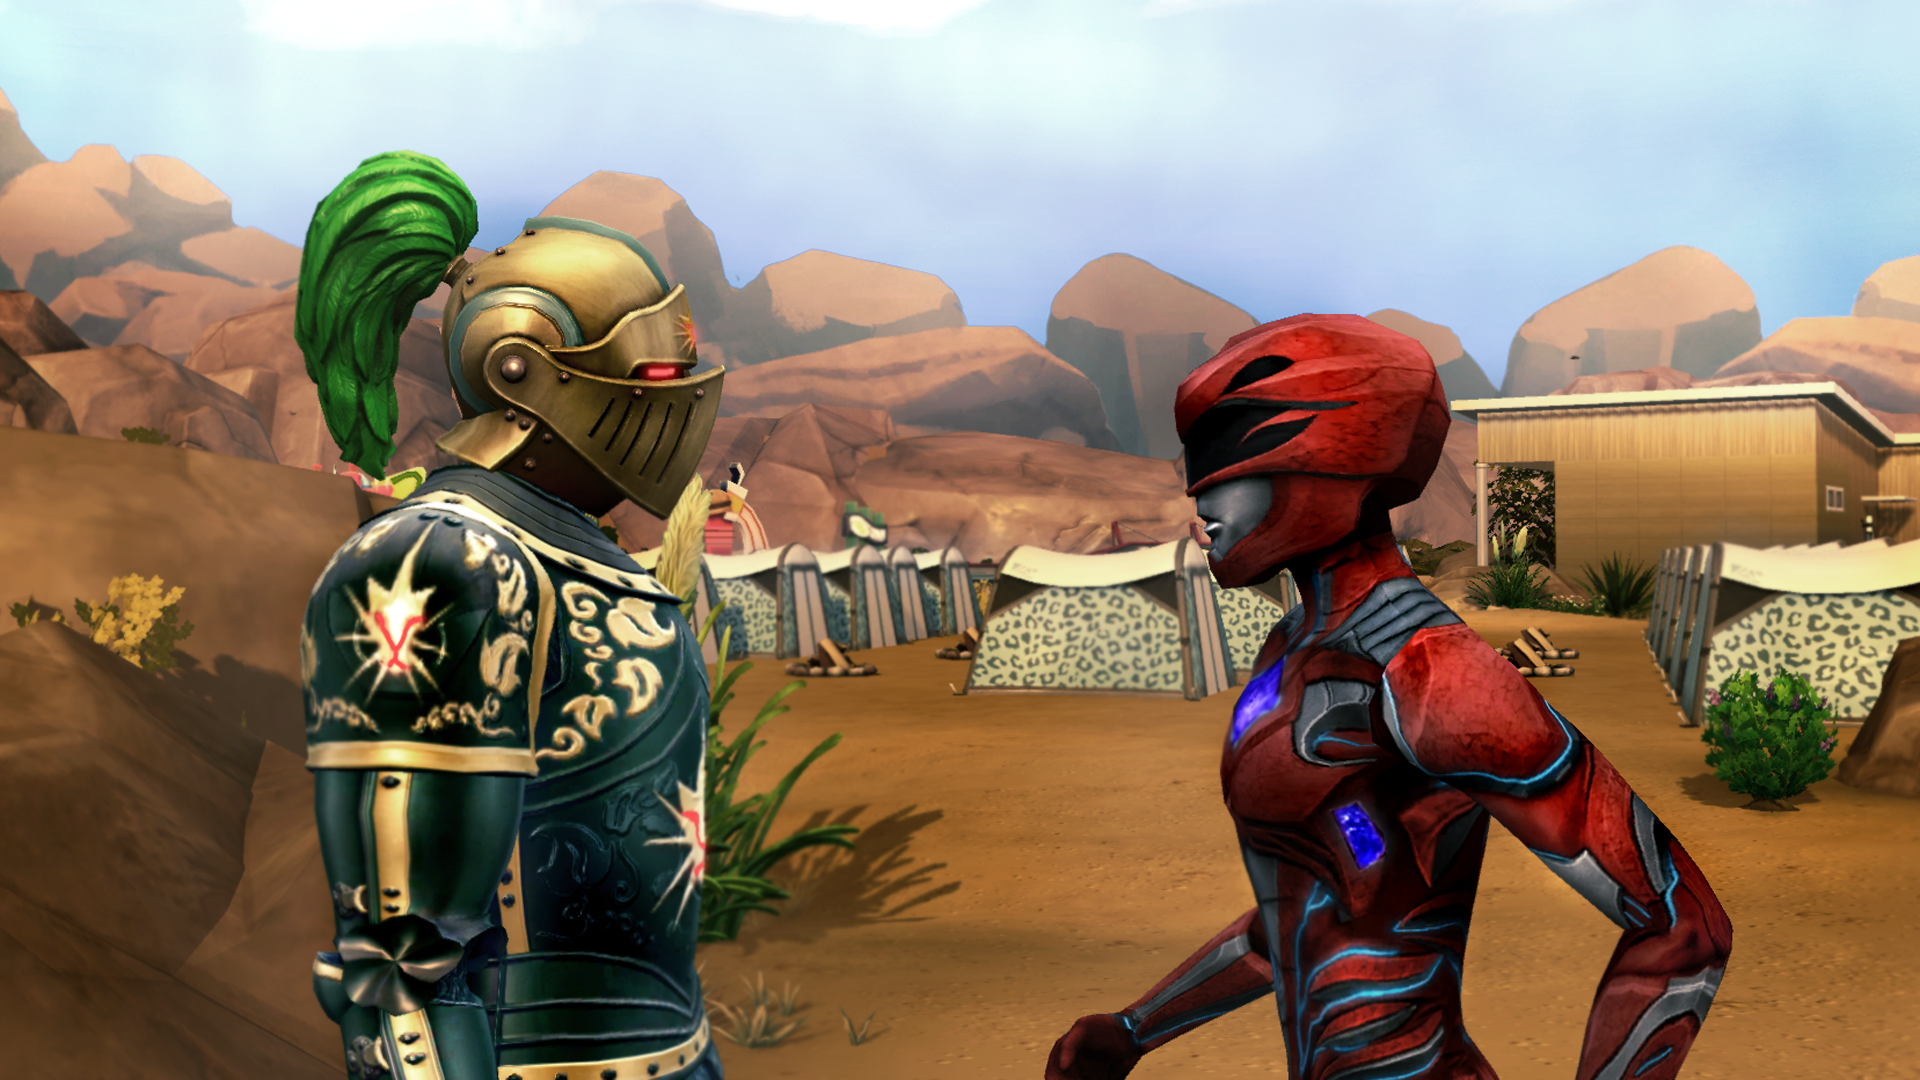 Volkonir Meets the Power Rangers Wallpaper